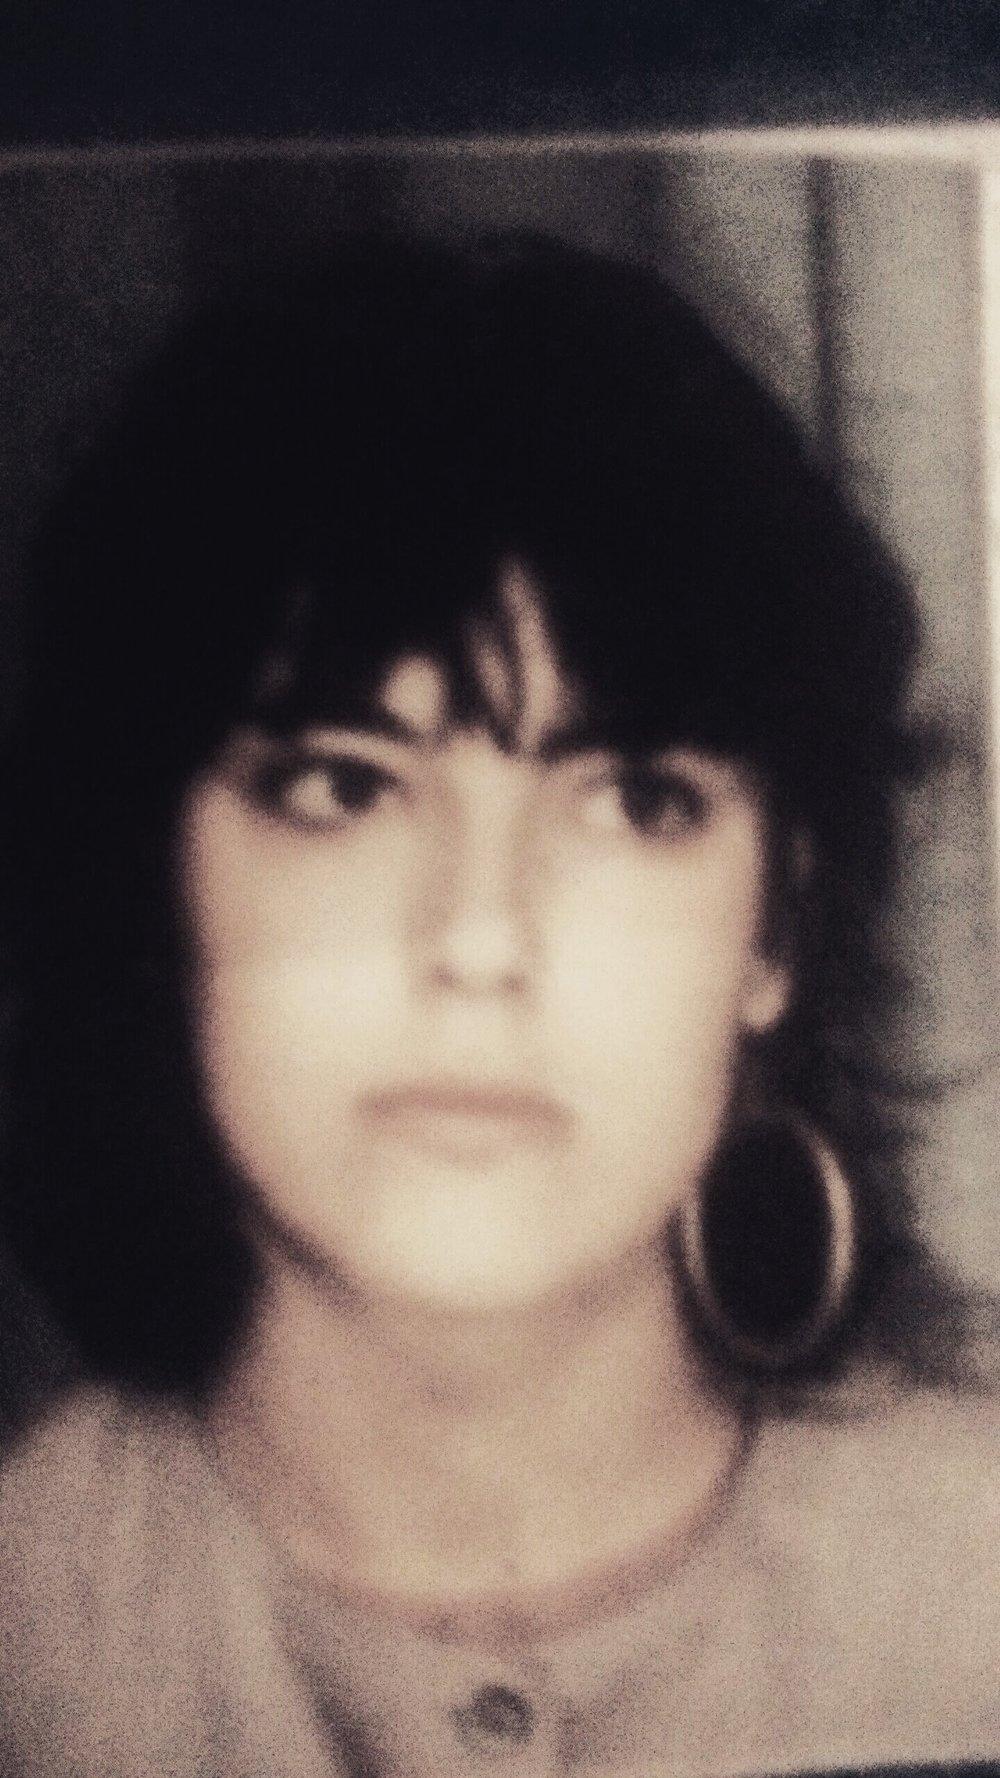 Sally Wilson aged 17